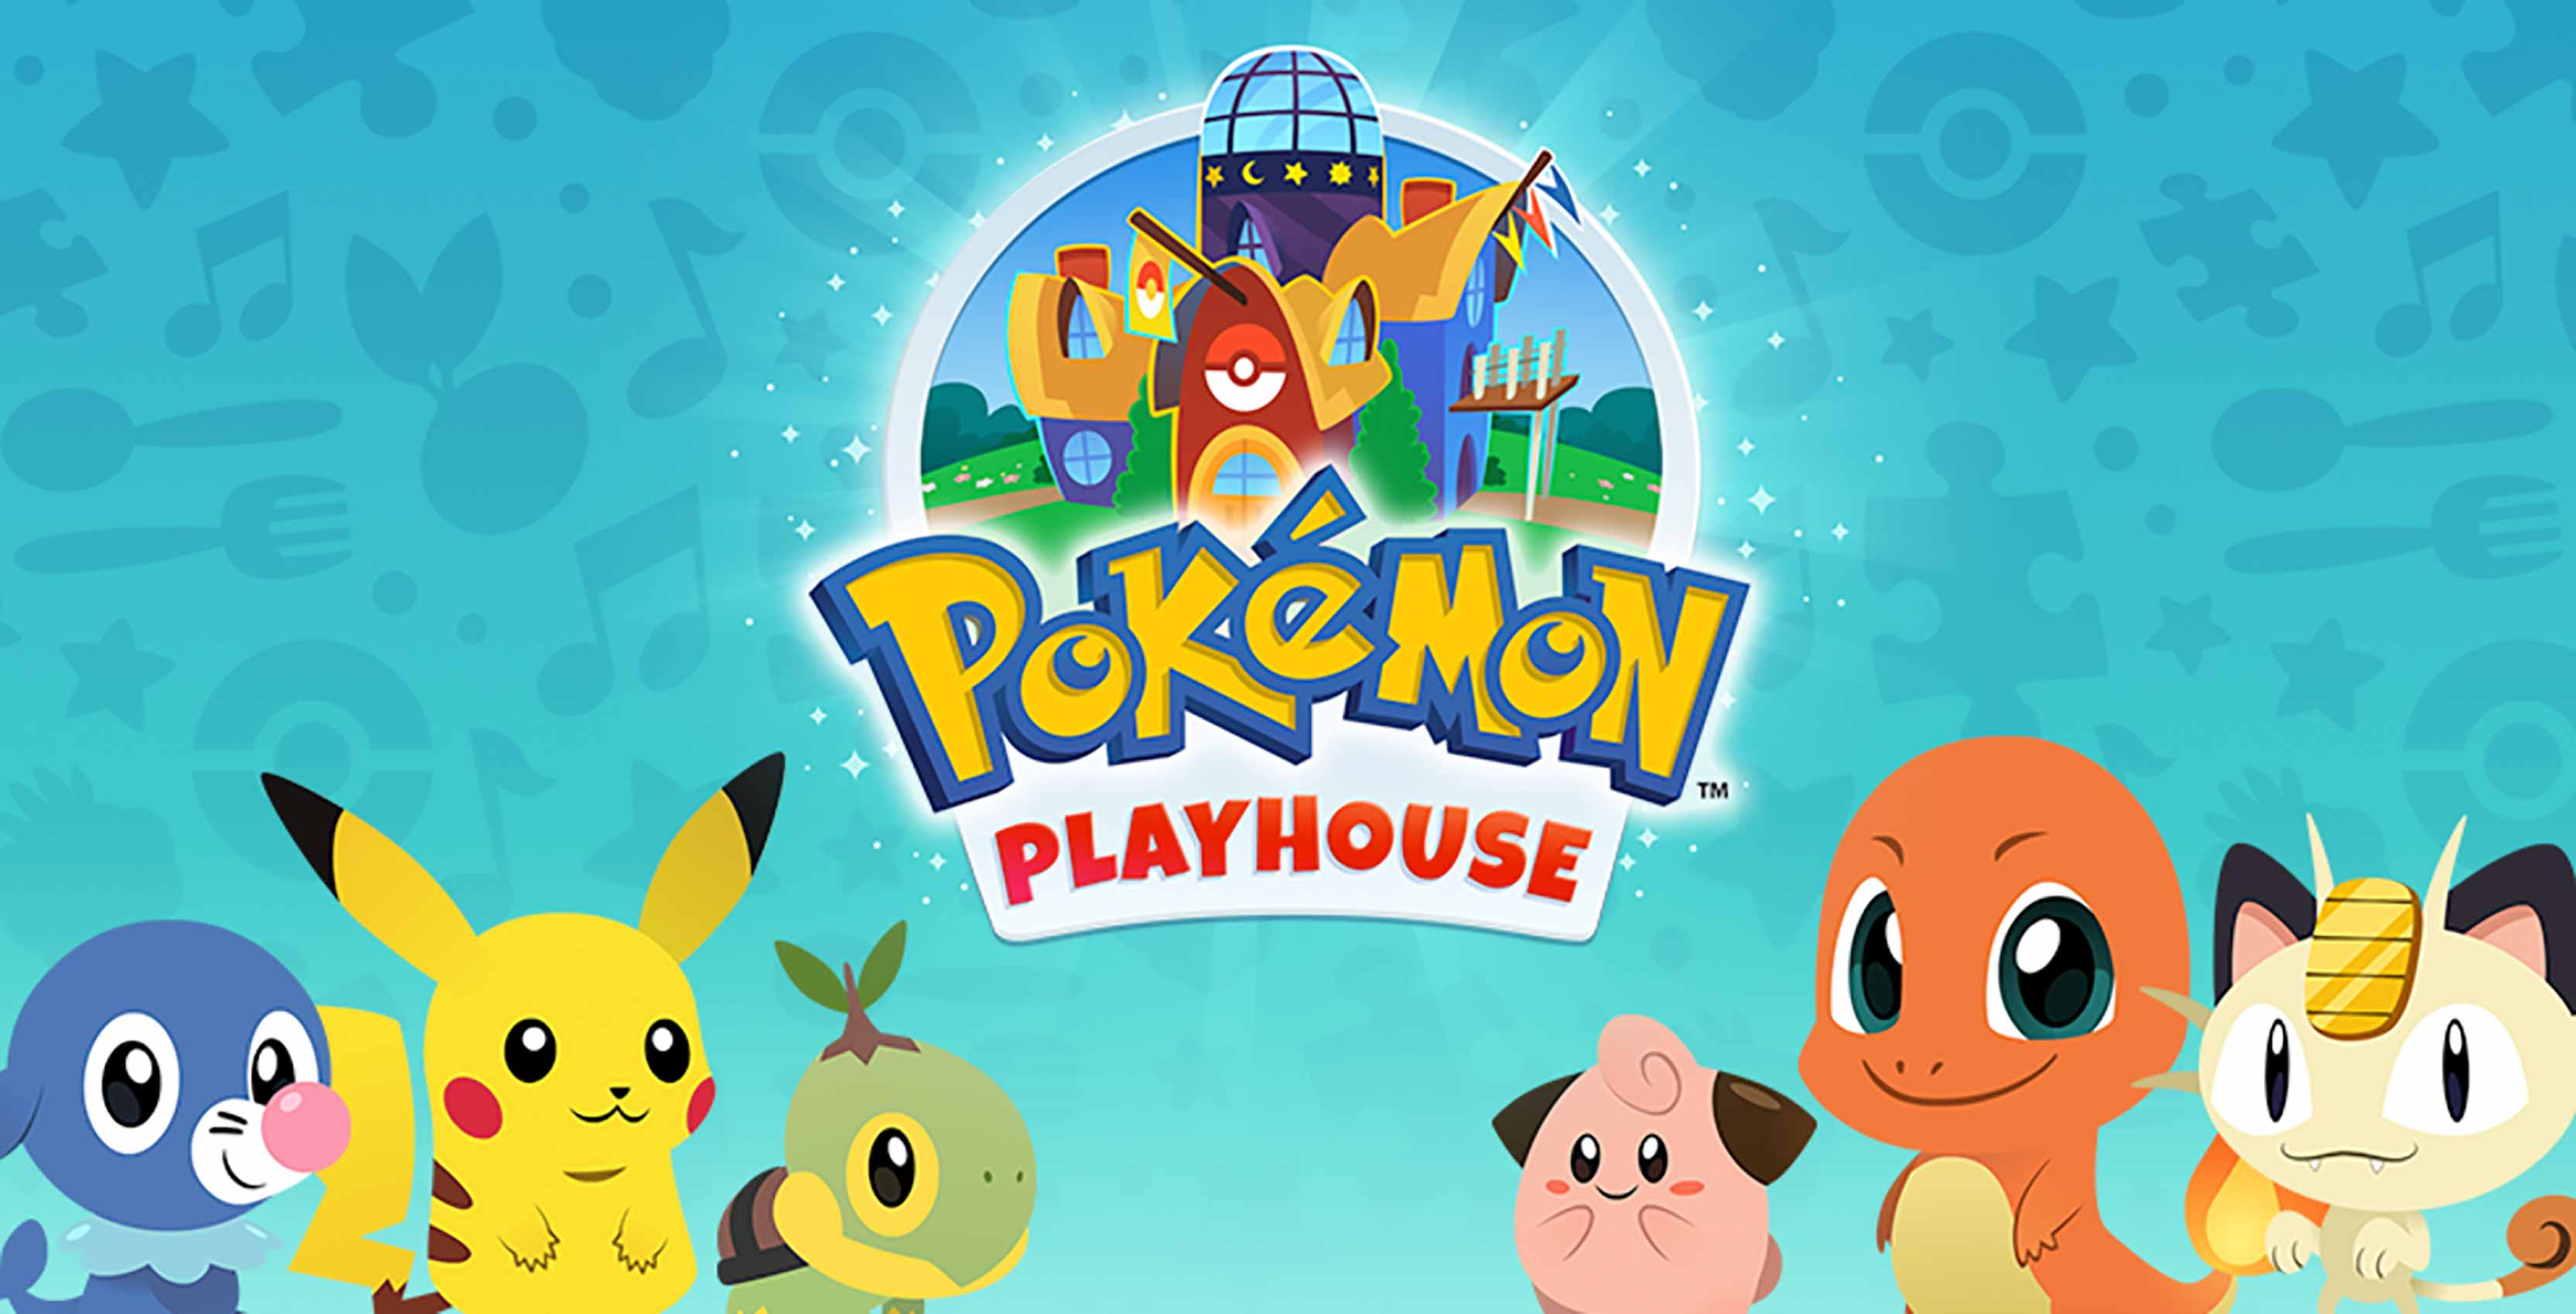 Pokemon Playhouse game